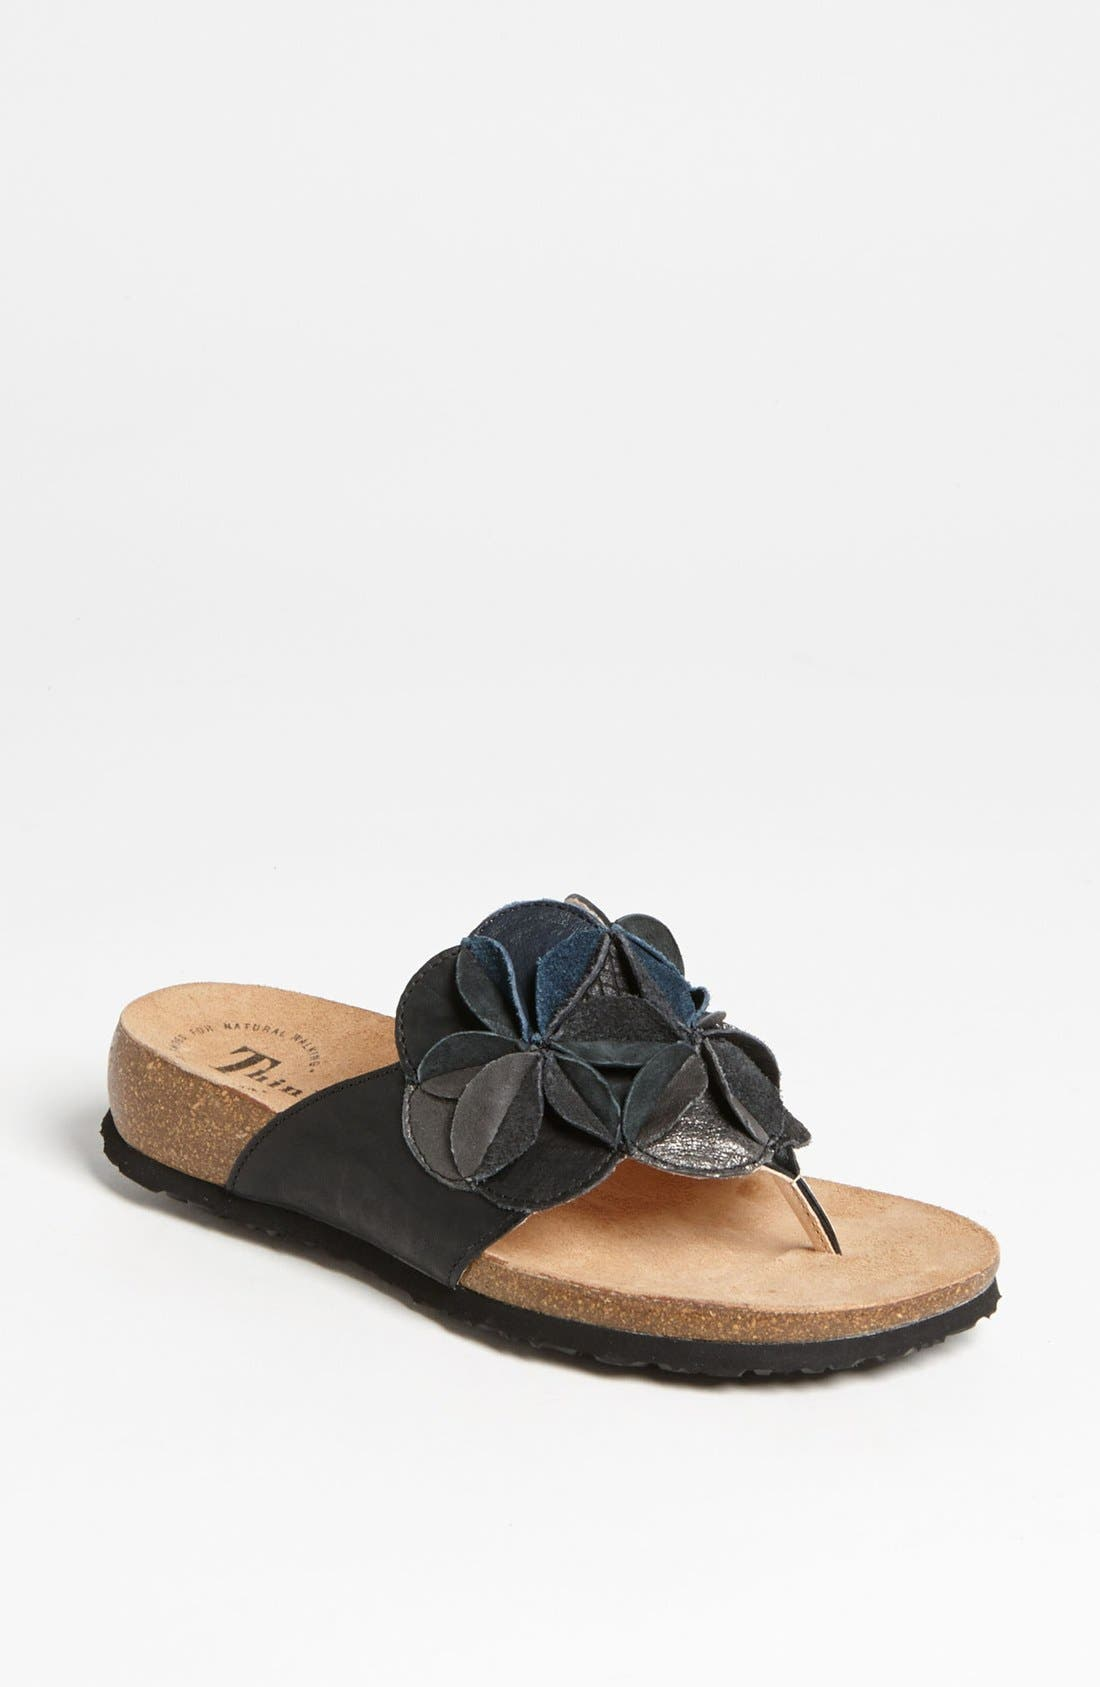 Alternate Image 1 Selected - Think! 'Julia' Sandal